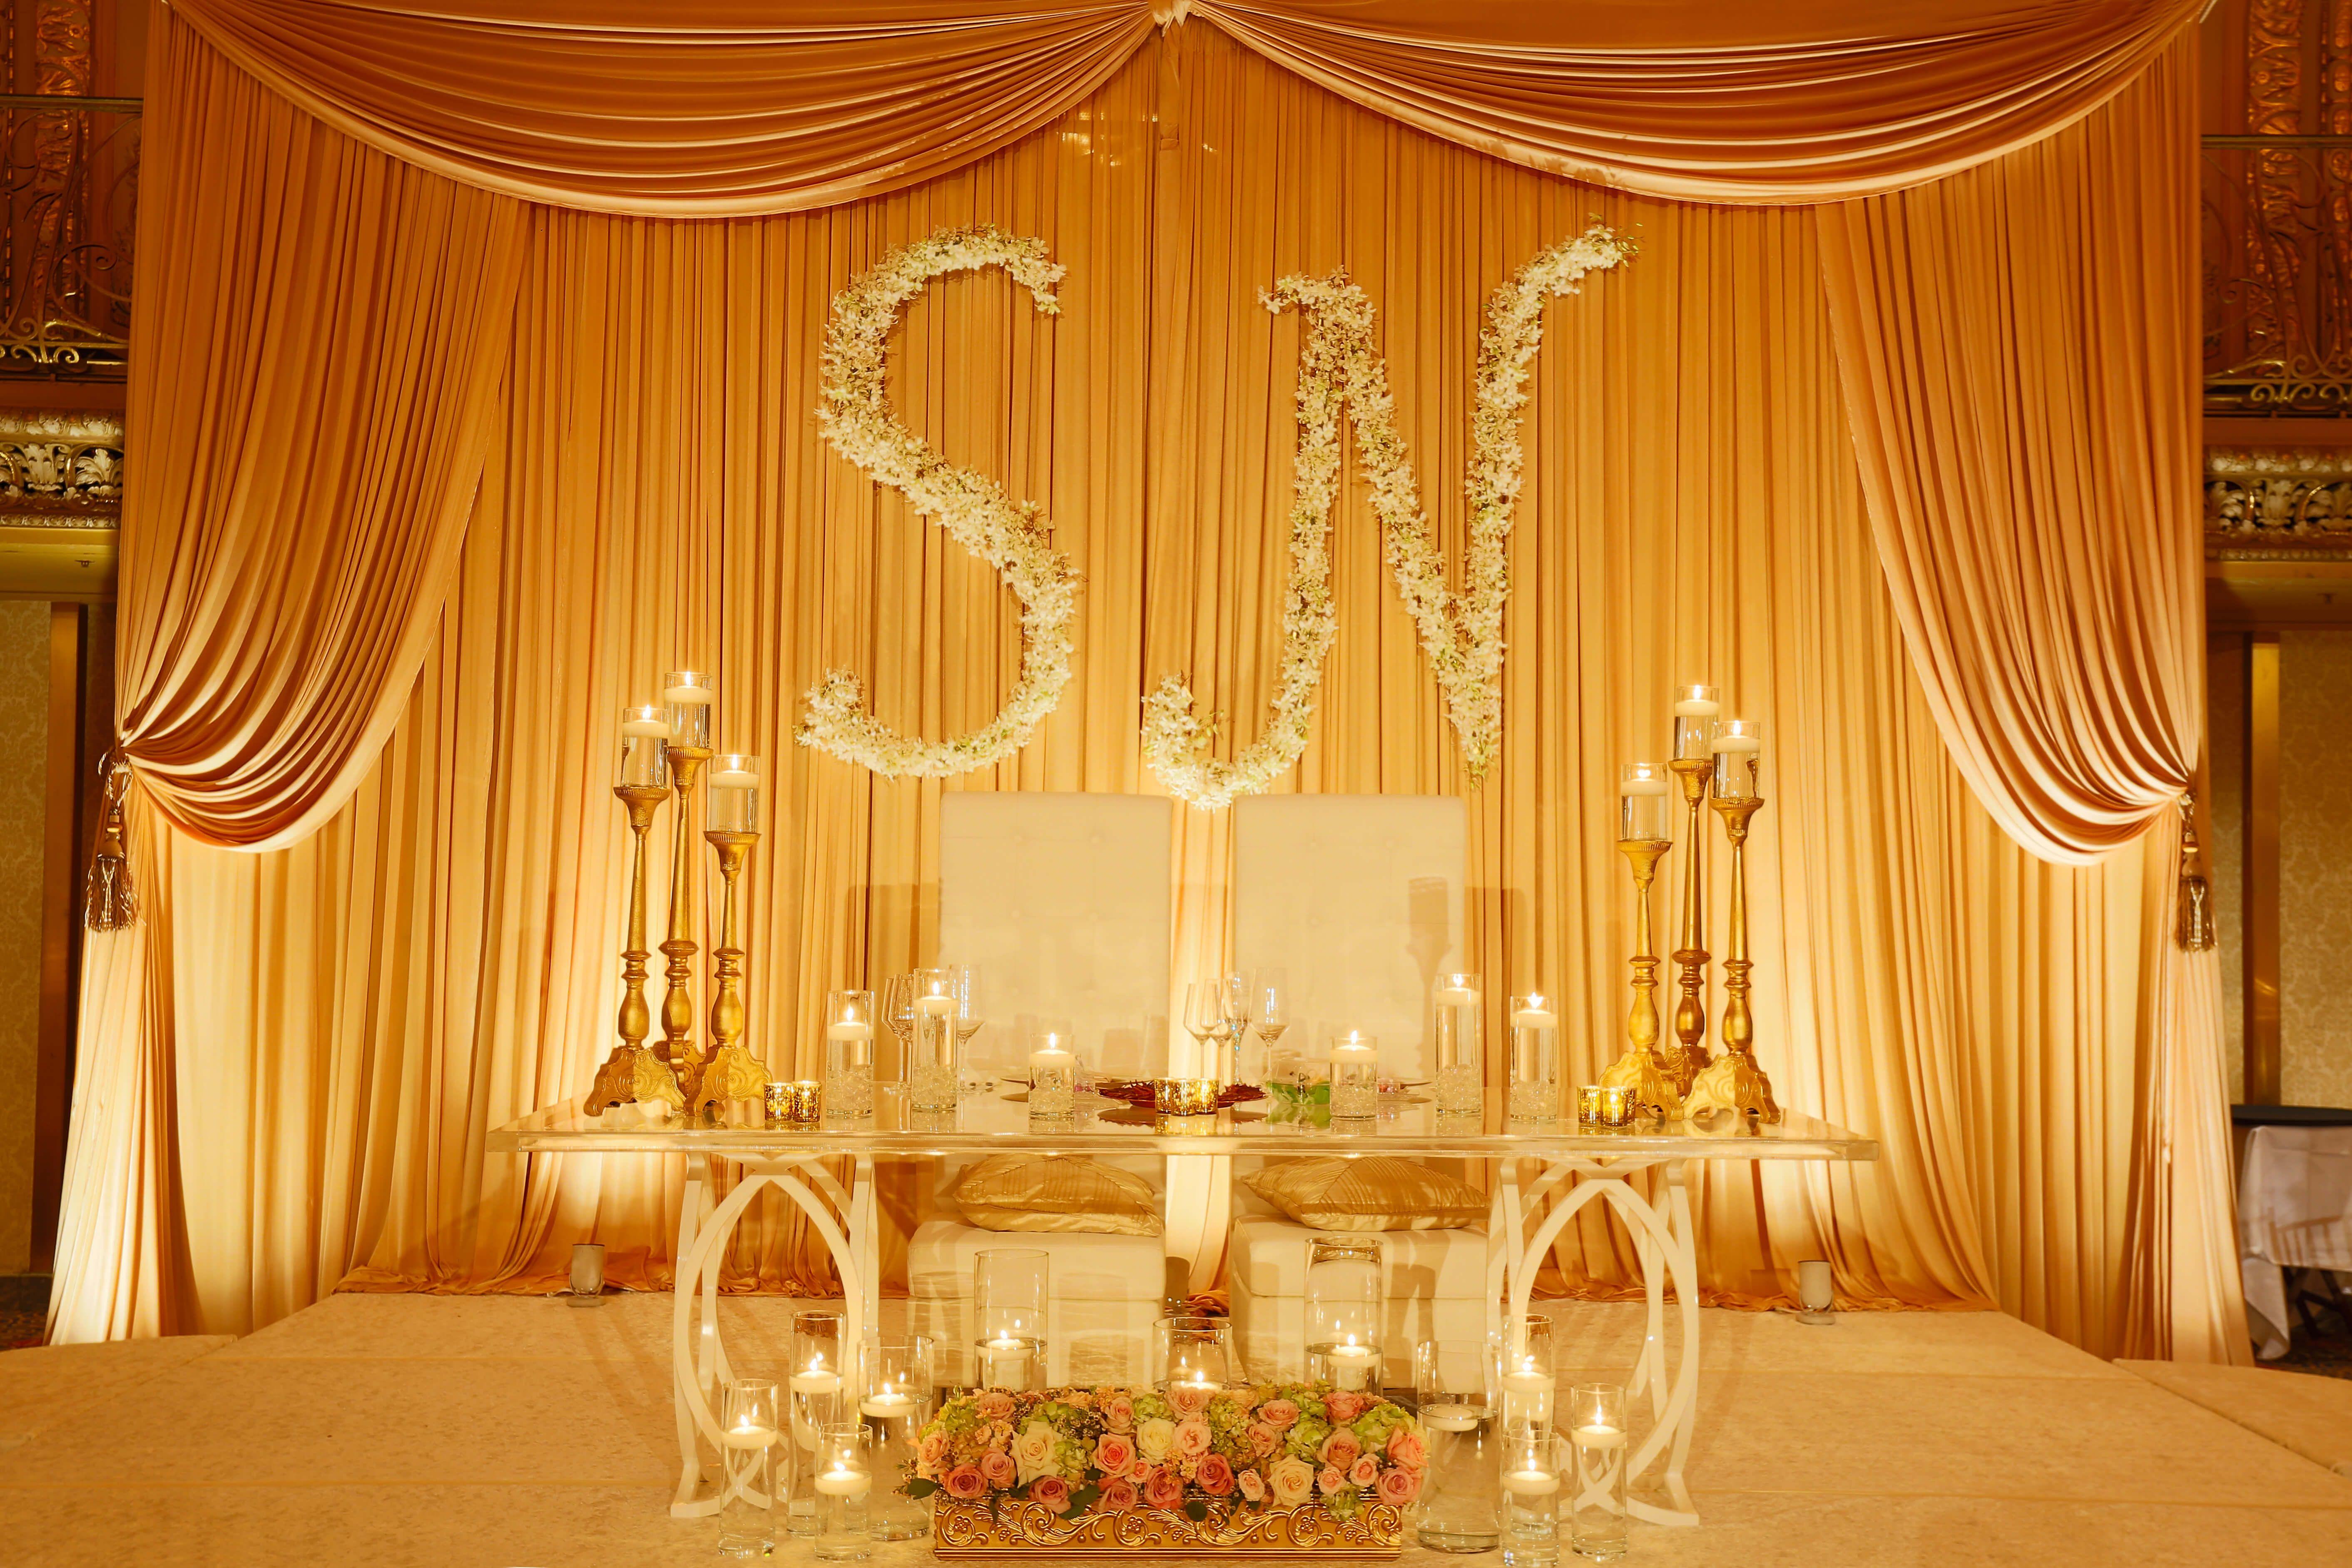 Wedding Flowers And Decorations Luxury Wedding Designers Wedding Backdrop Rentals Backdrop Decorations Backdrops